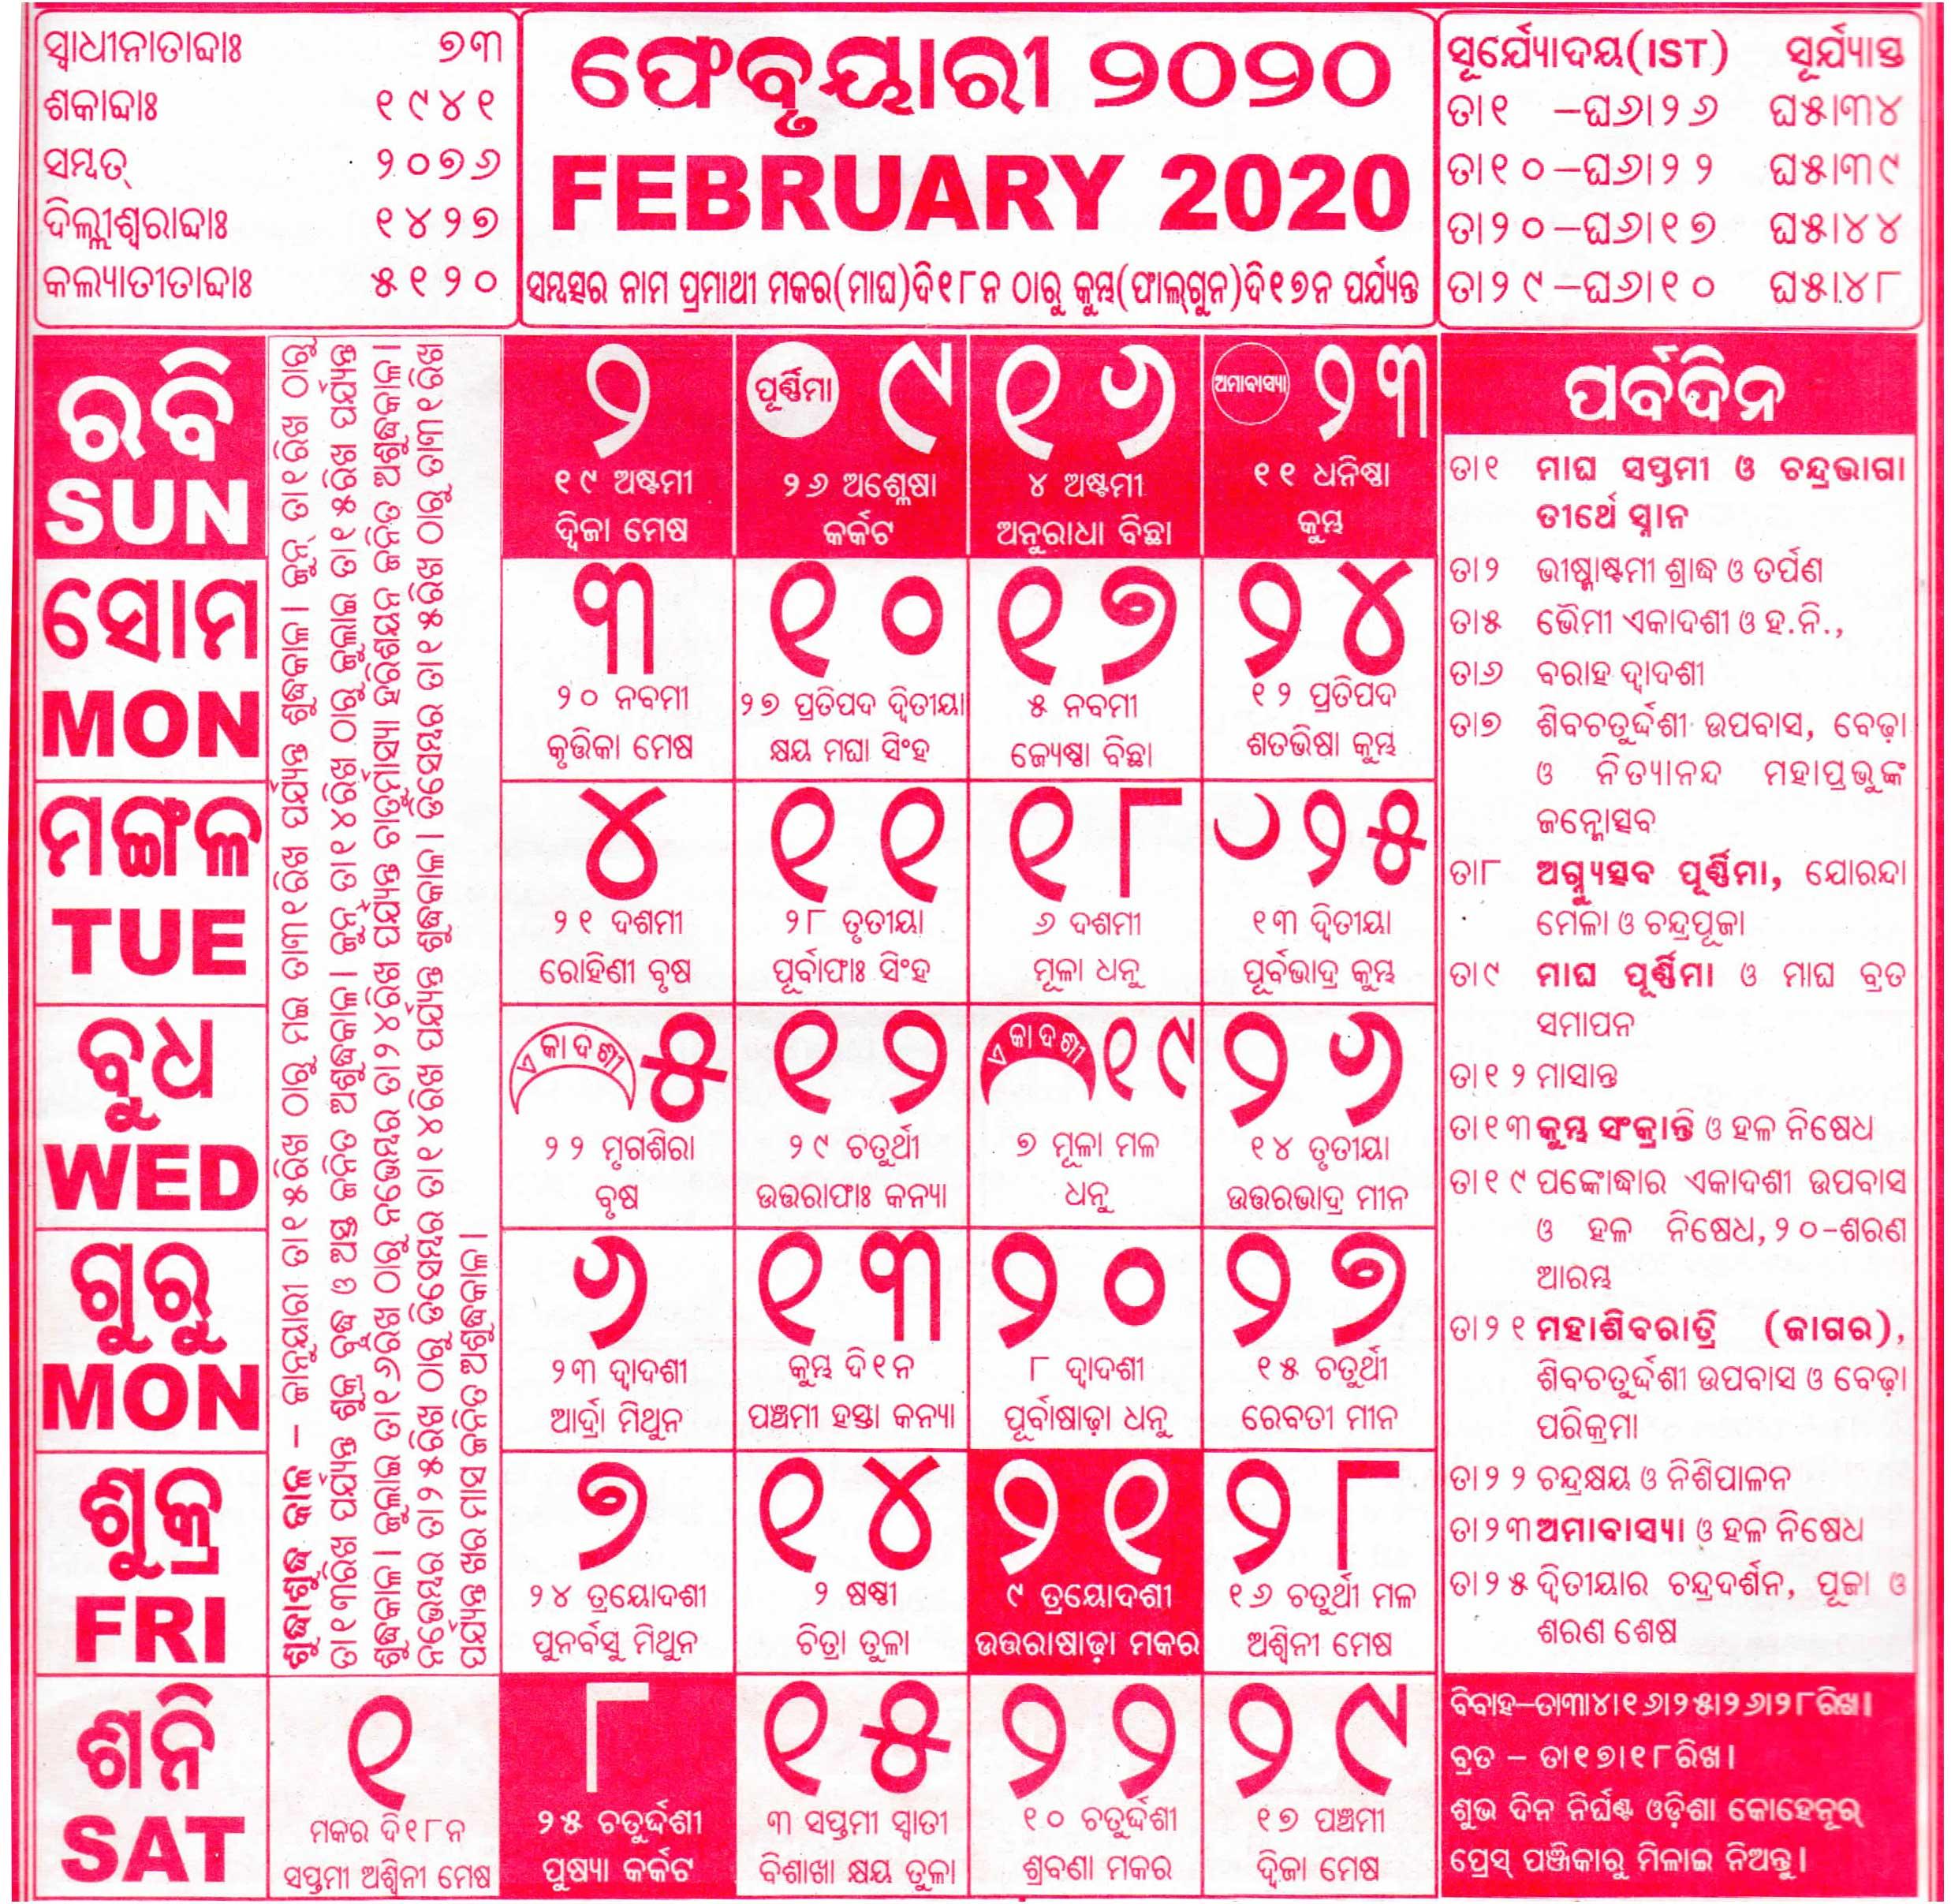 Odia Calendar February 2020 | | Calendarcraft with regard to 2020 Oriya Calendar